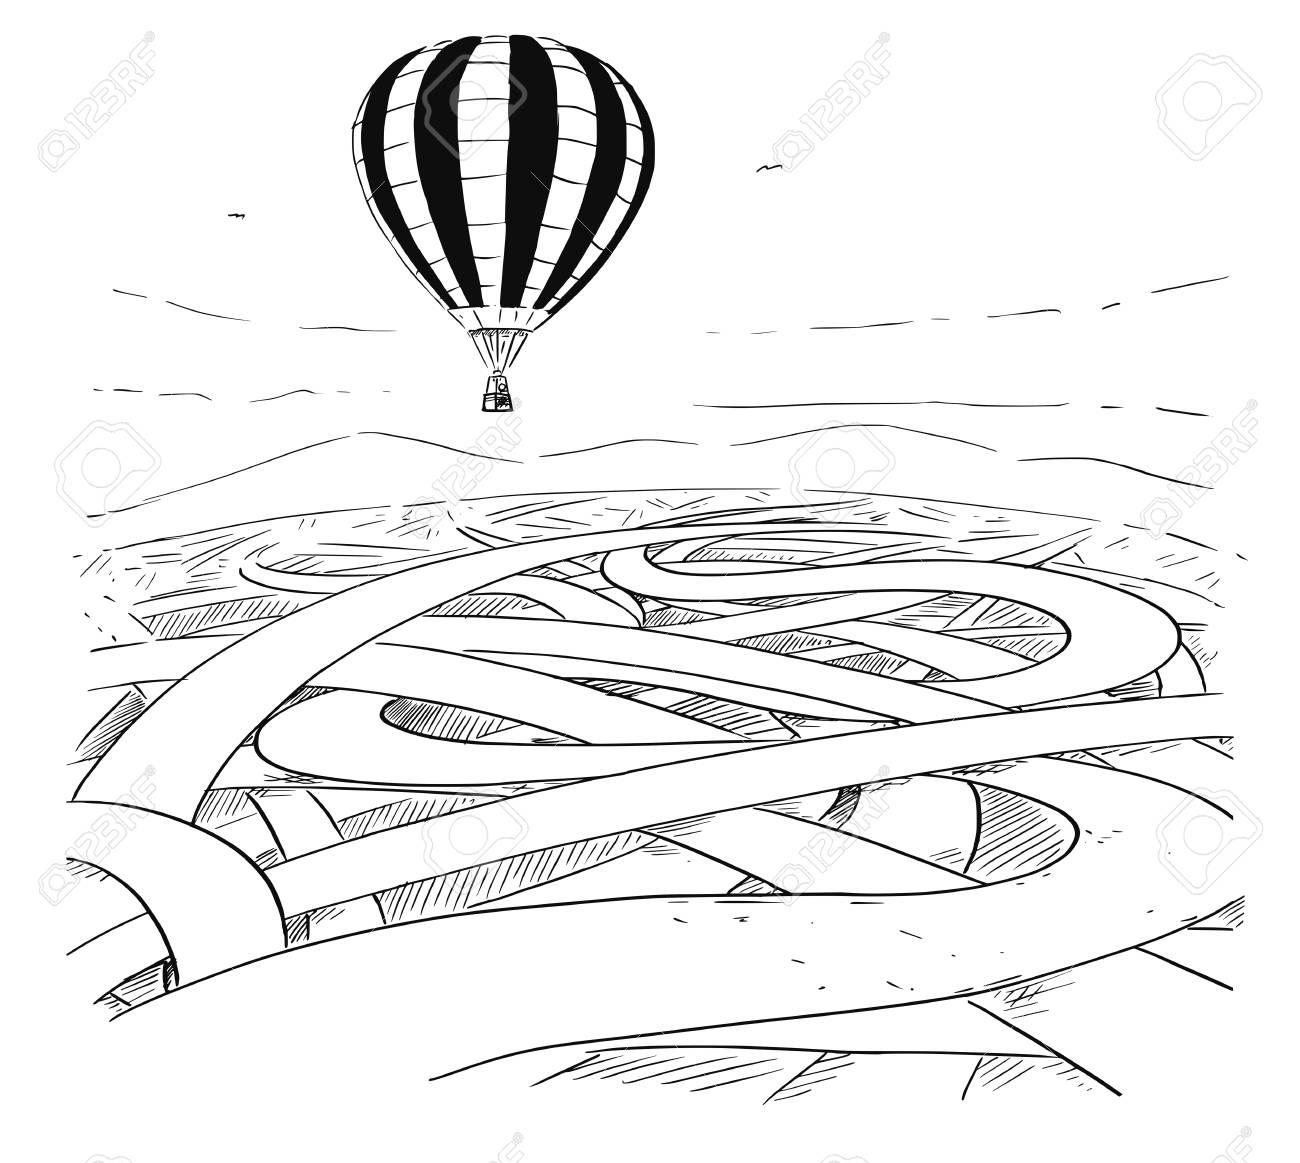 Cartoon Drawing Conceptual Illustration Of Hot Air Balloon Flying